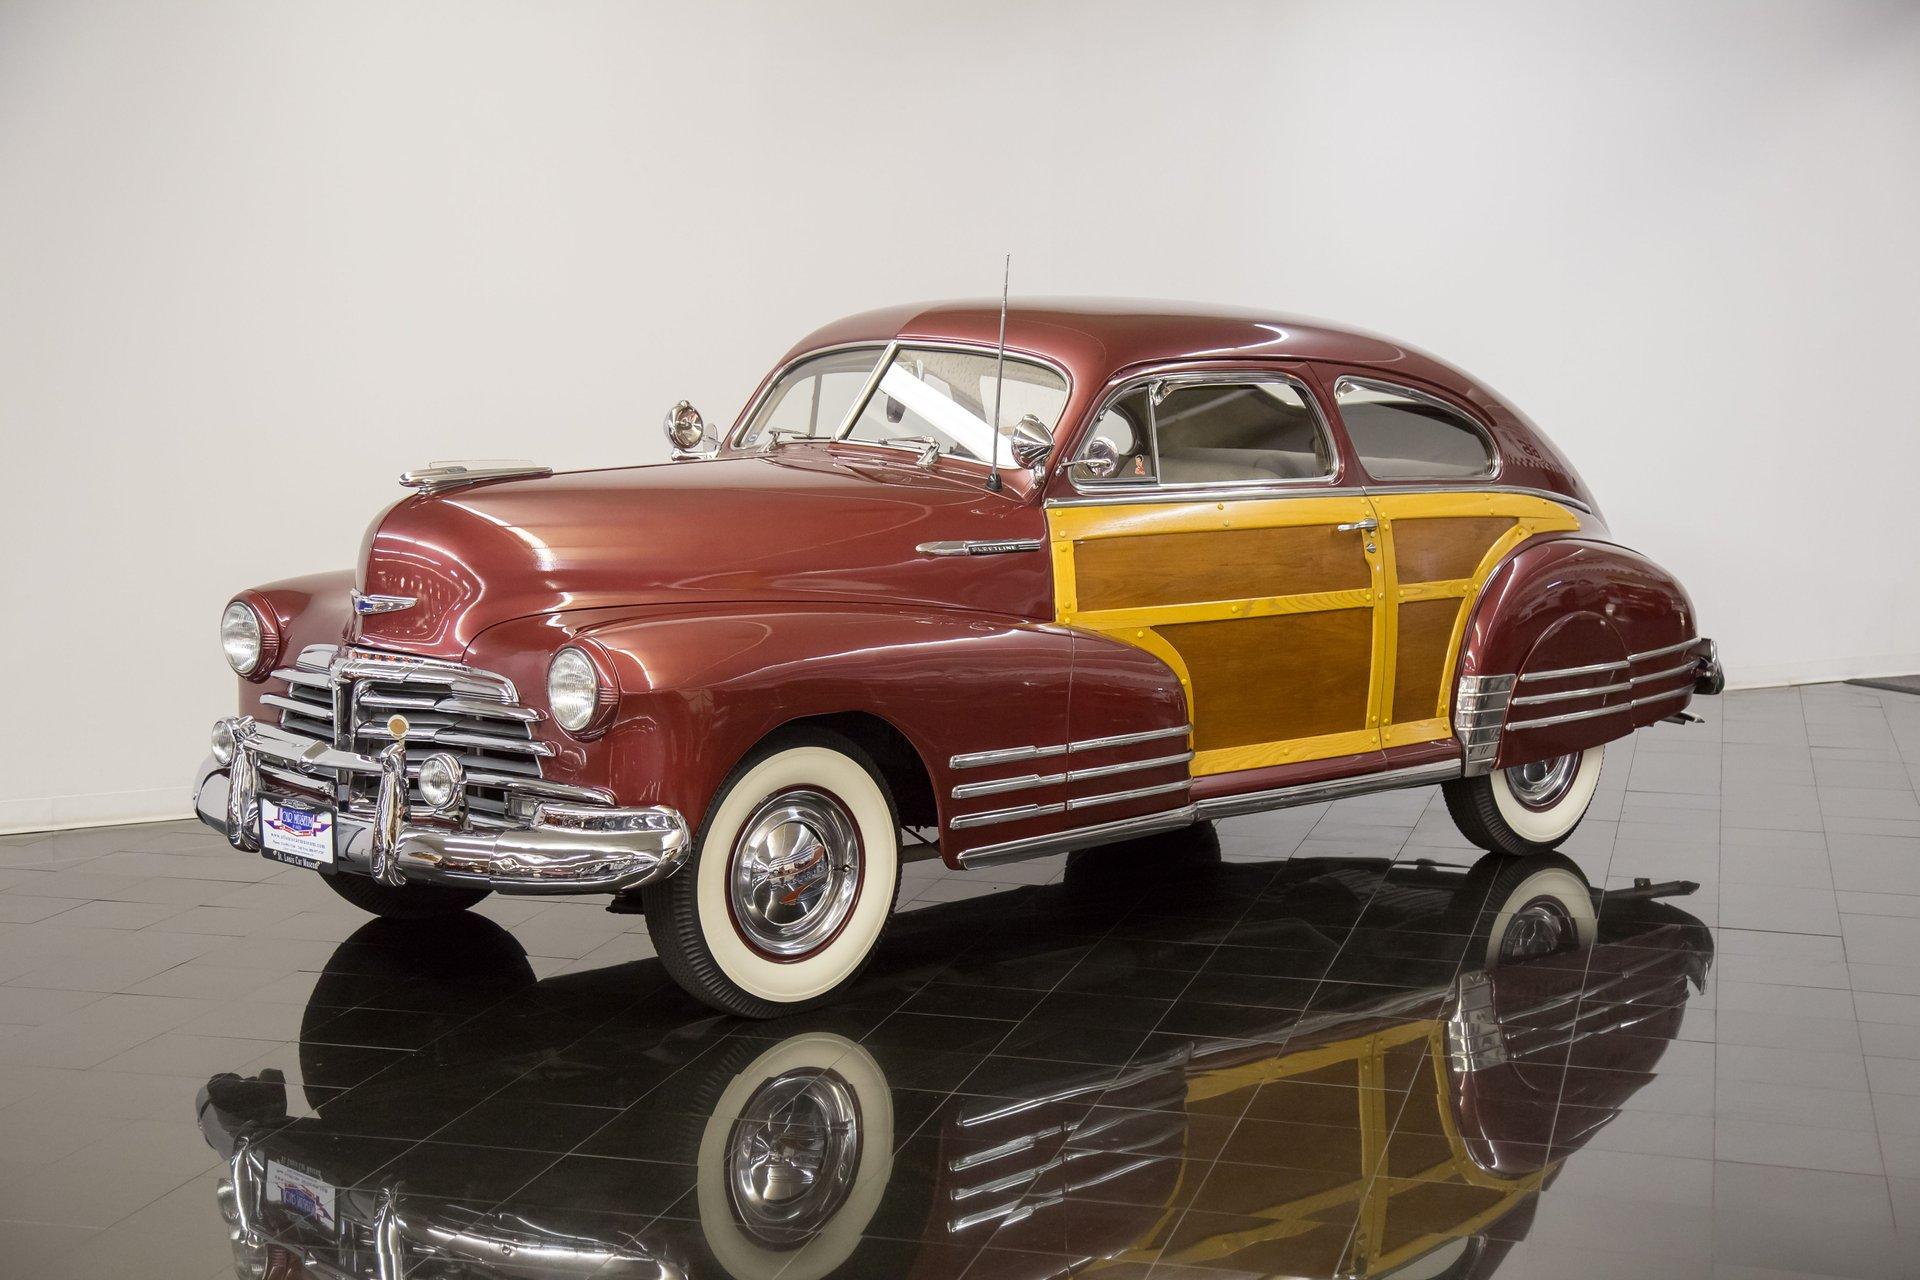 1948 Chevrolet Fleetline Country Club Aerosedan Sedan